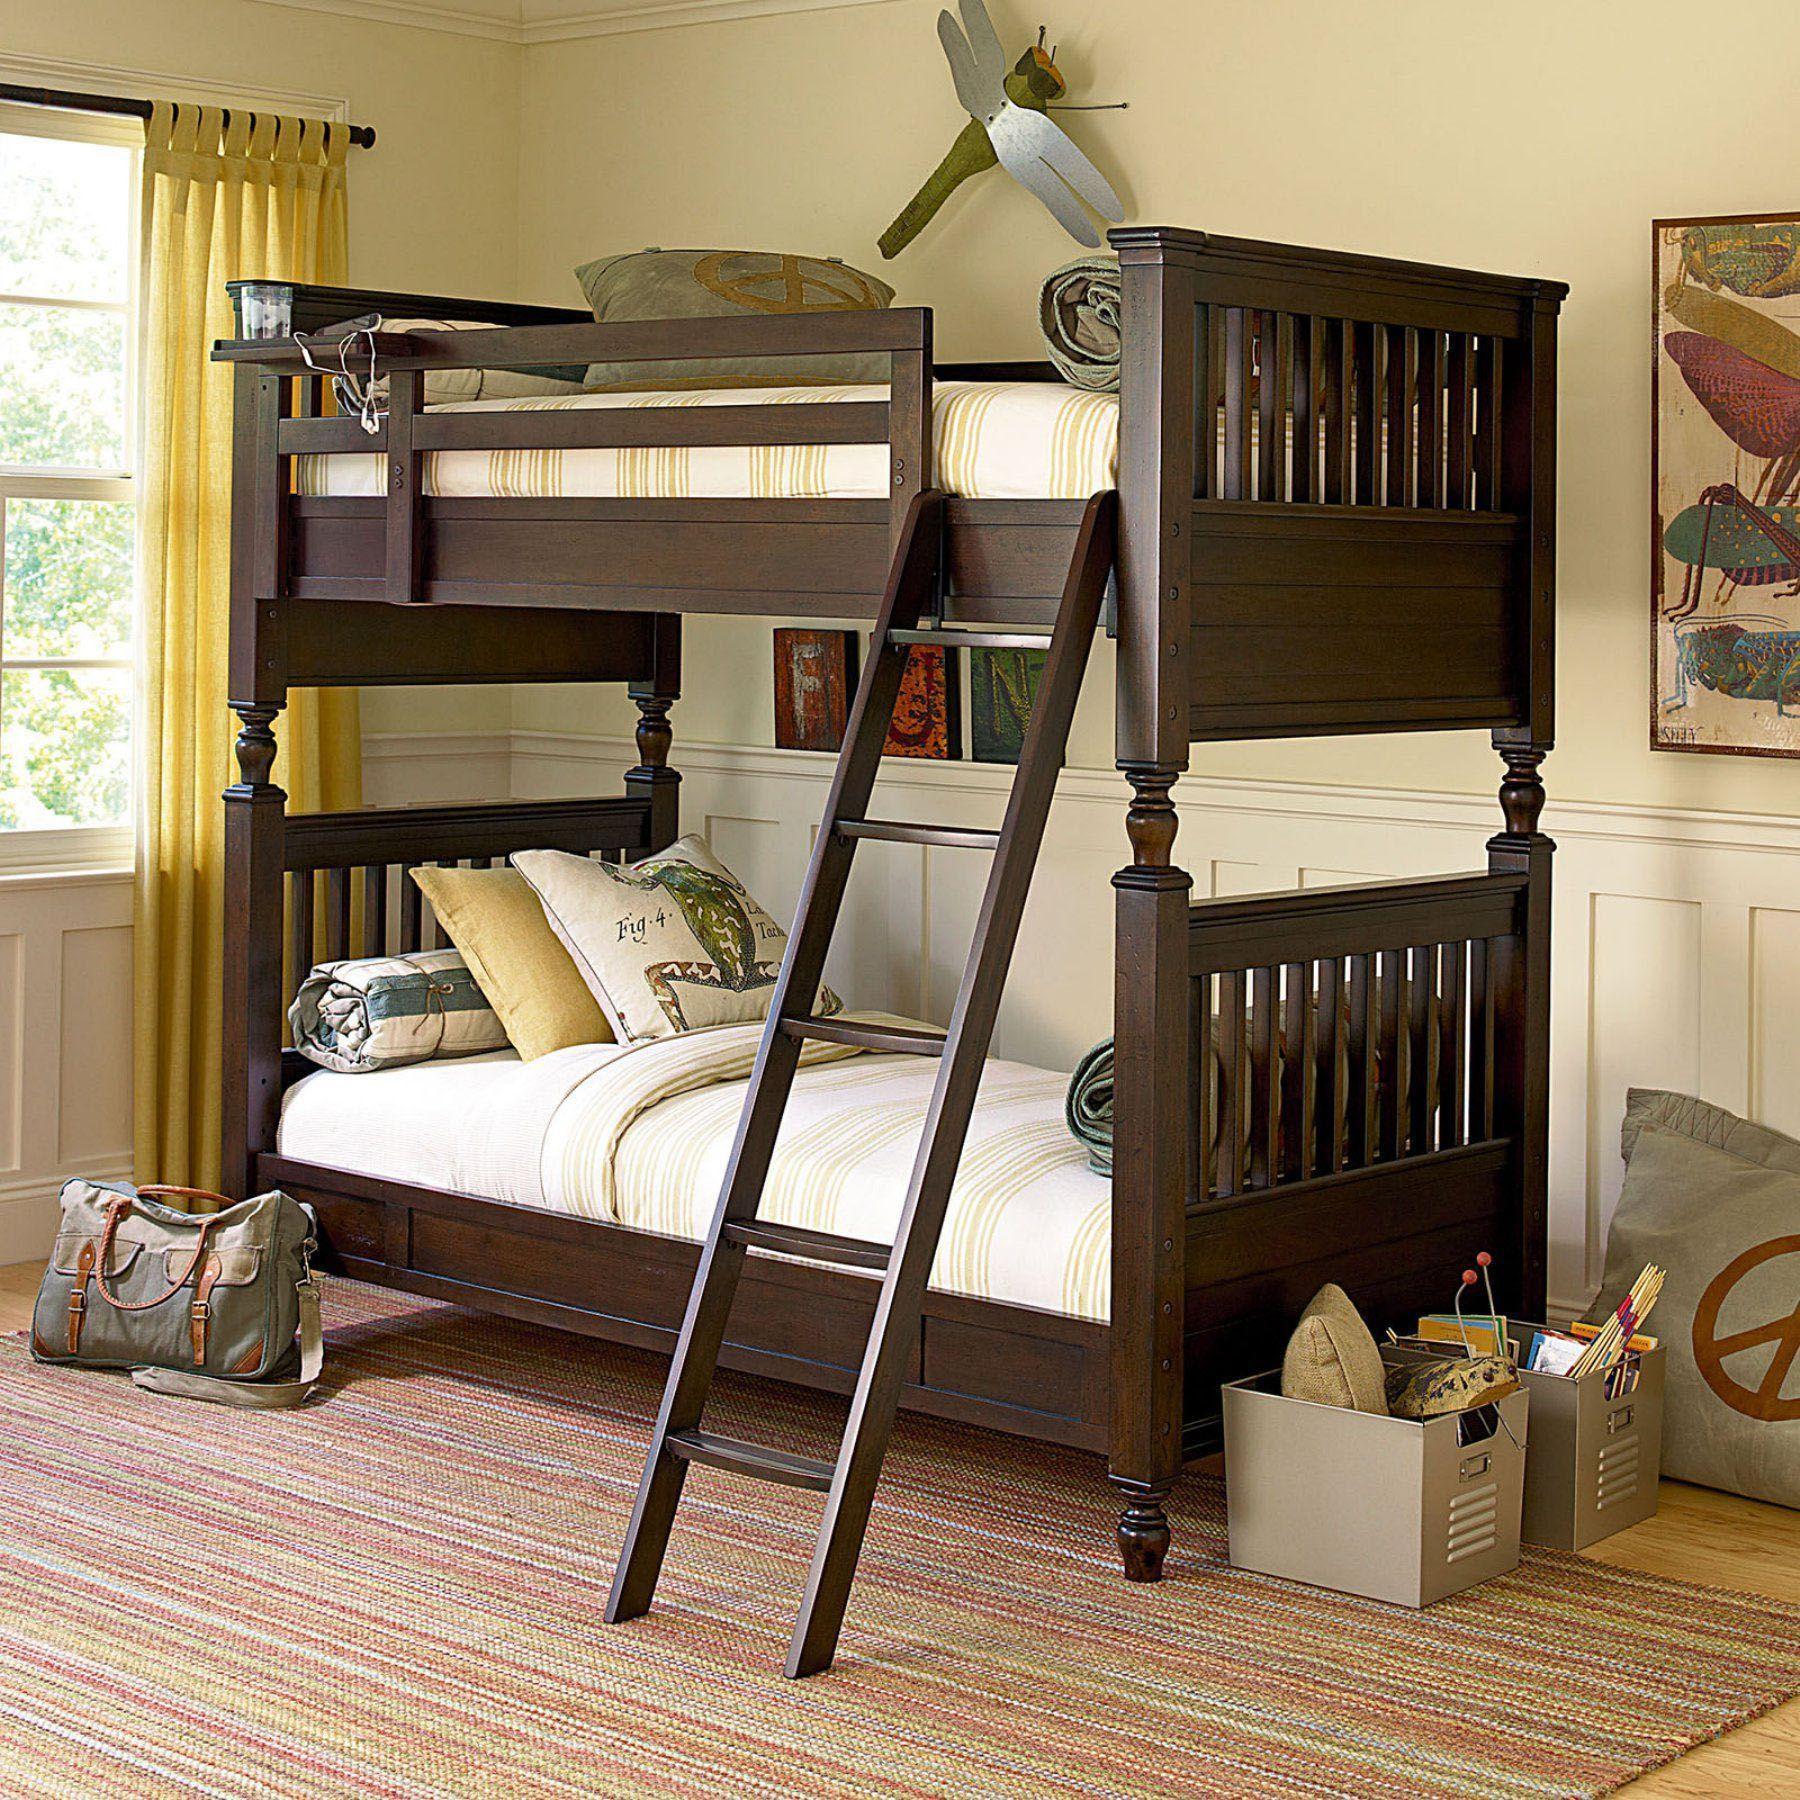 Fantastic twin bedroom set sam's club for 2019   Bunk beds ...